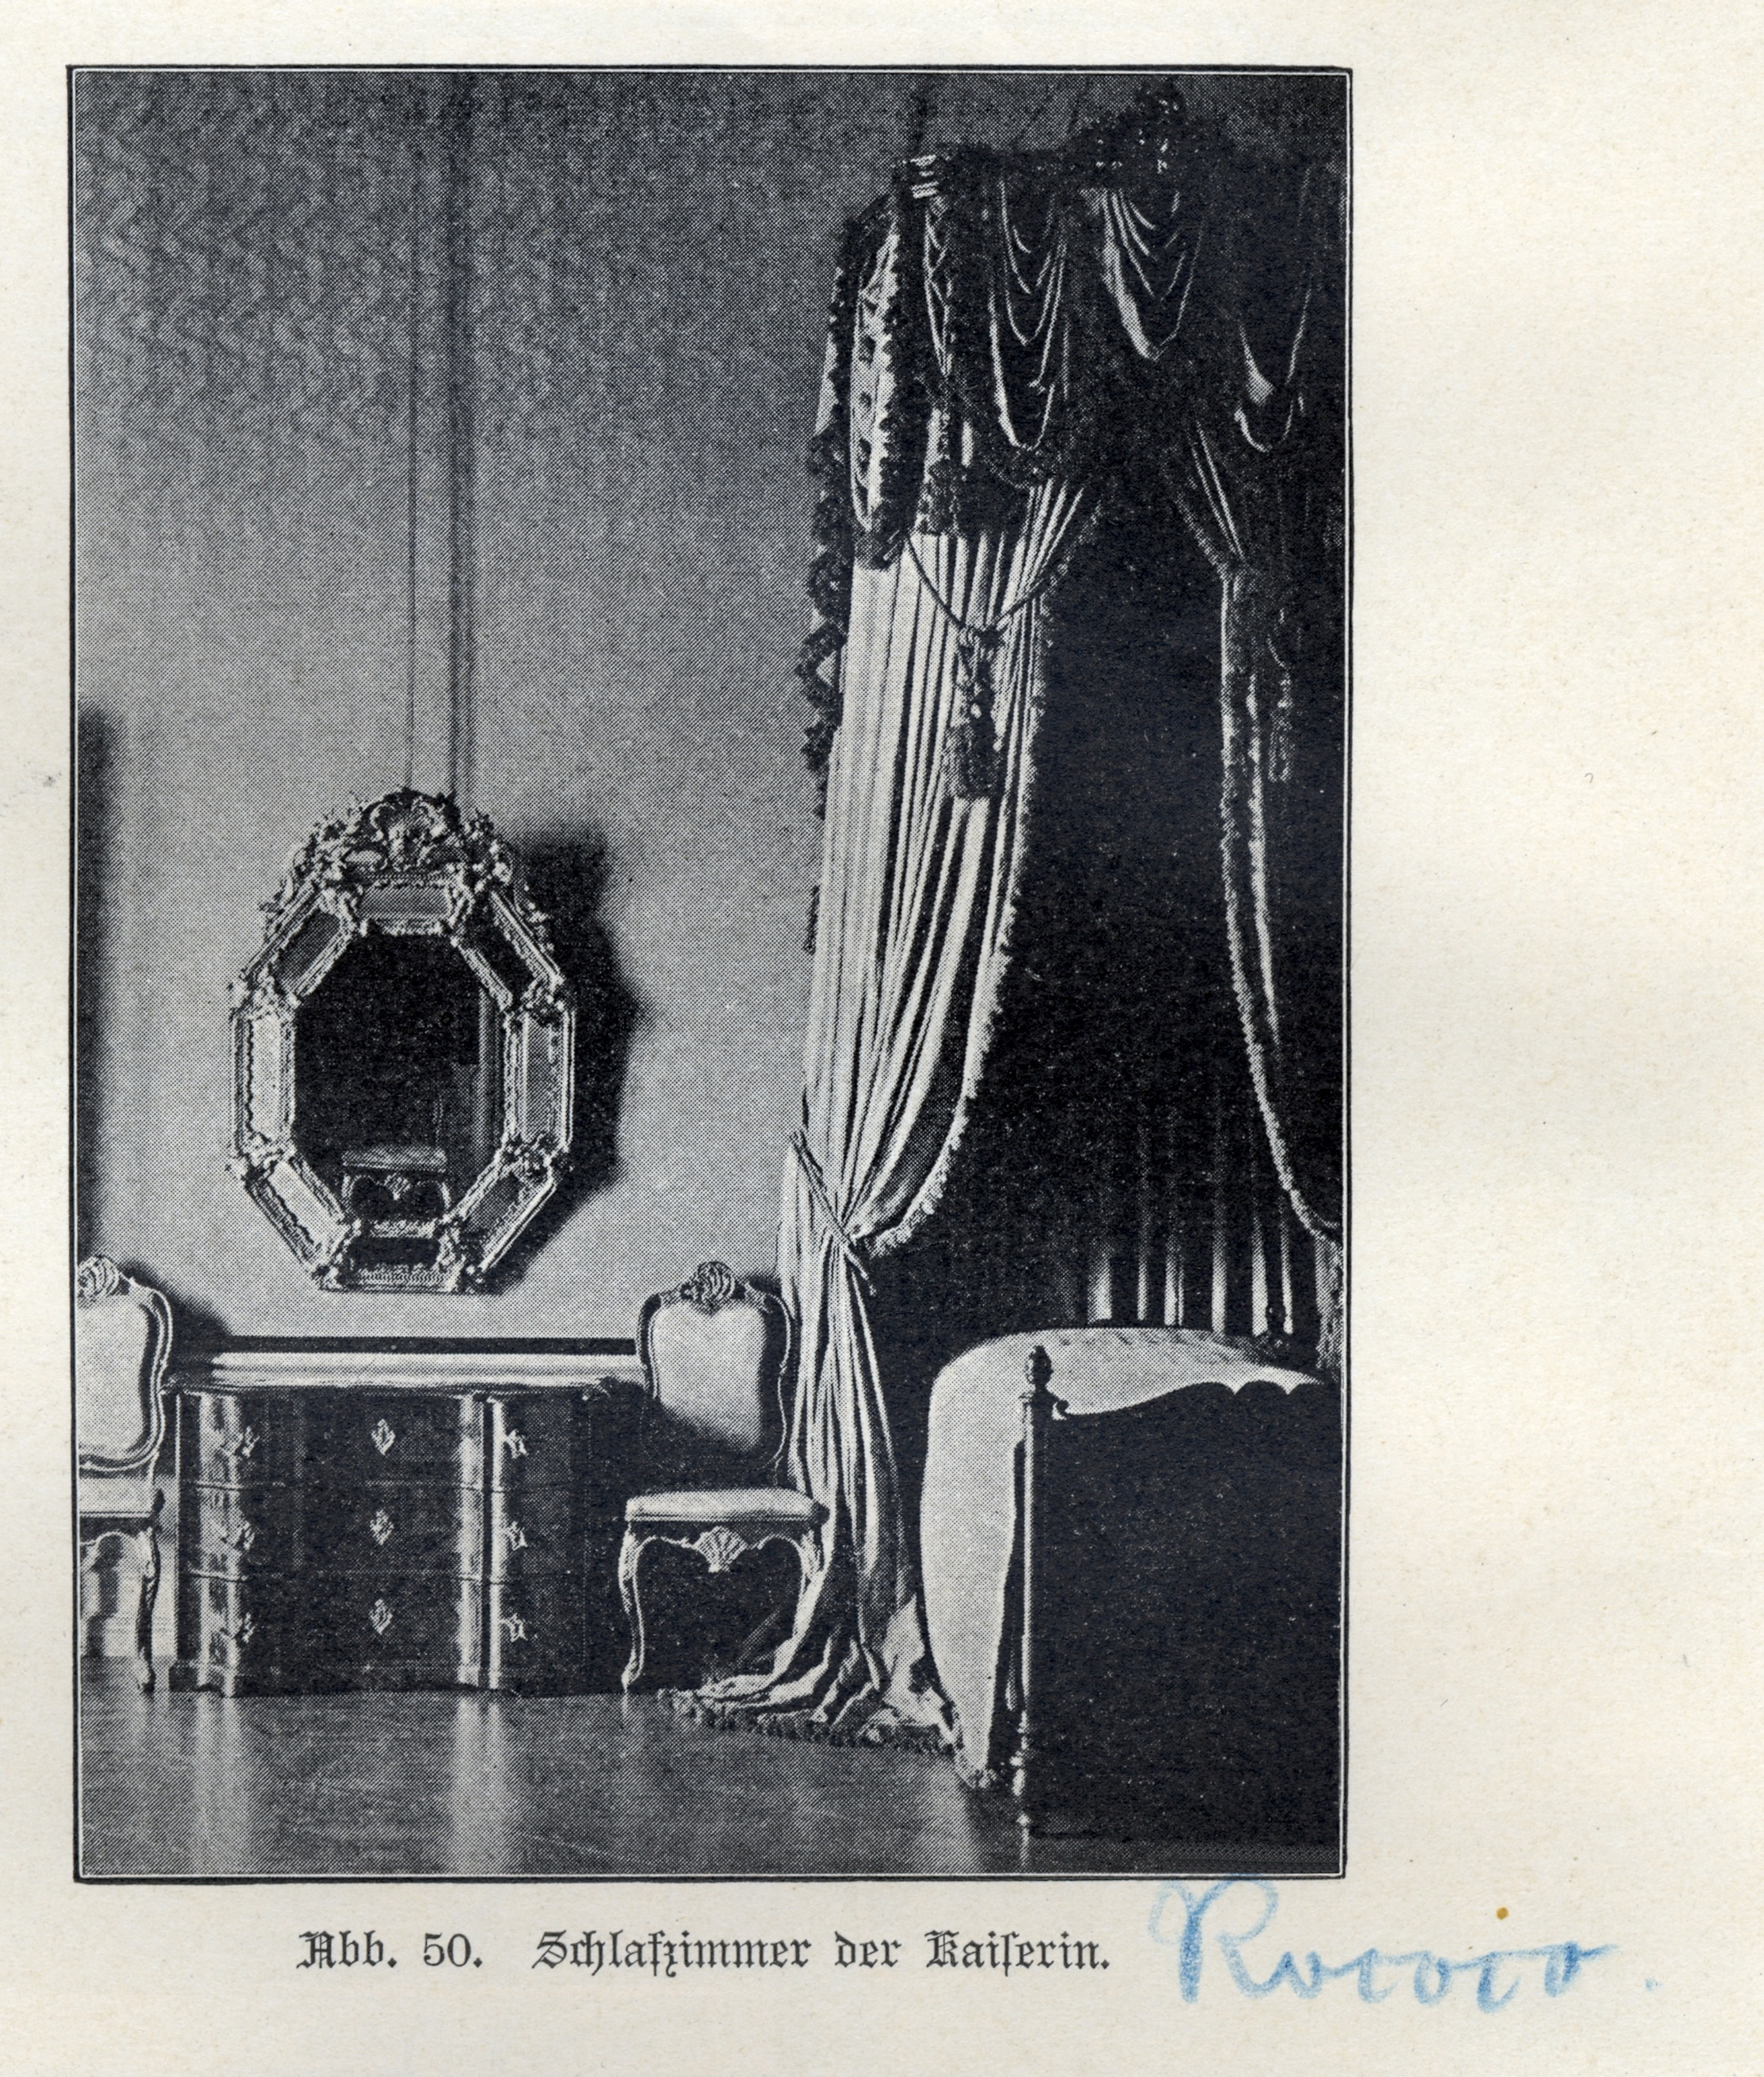 Datei:Königsberg, Schloss, Schlafzimmer, Rokoko.jpg – Wikipedia